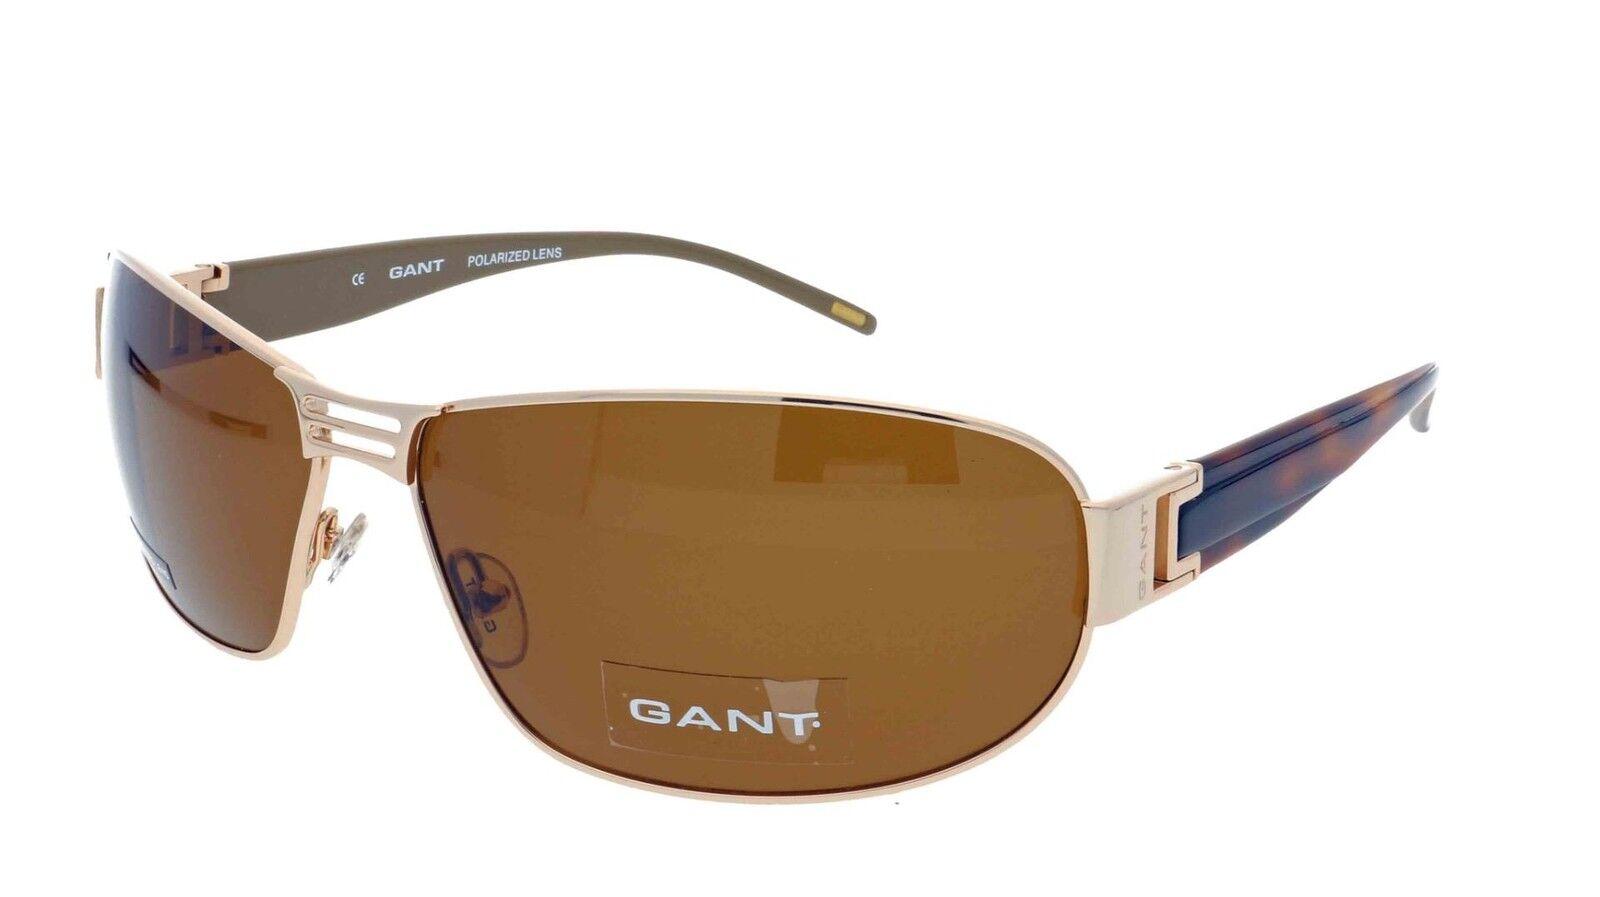 GANT GS GS GS Captree GLD-1P Mens Genuine Designer Polarised Sunglasses + Case braun | Modern Und Elegant  a4805a